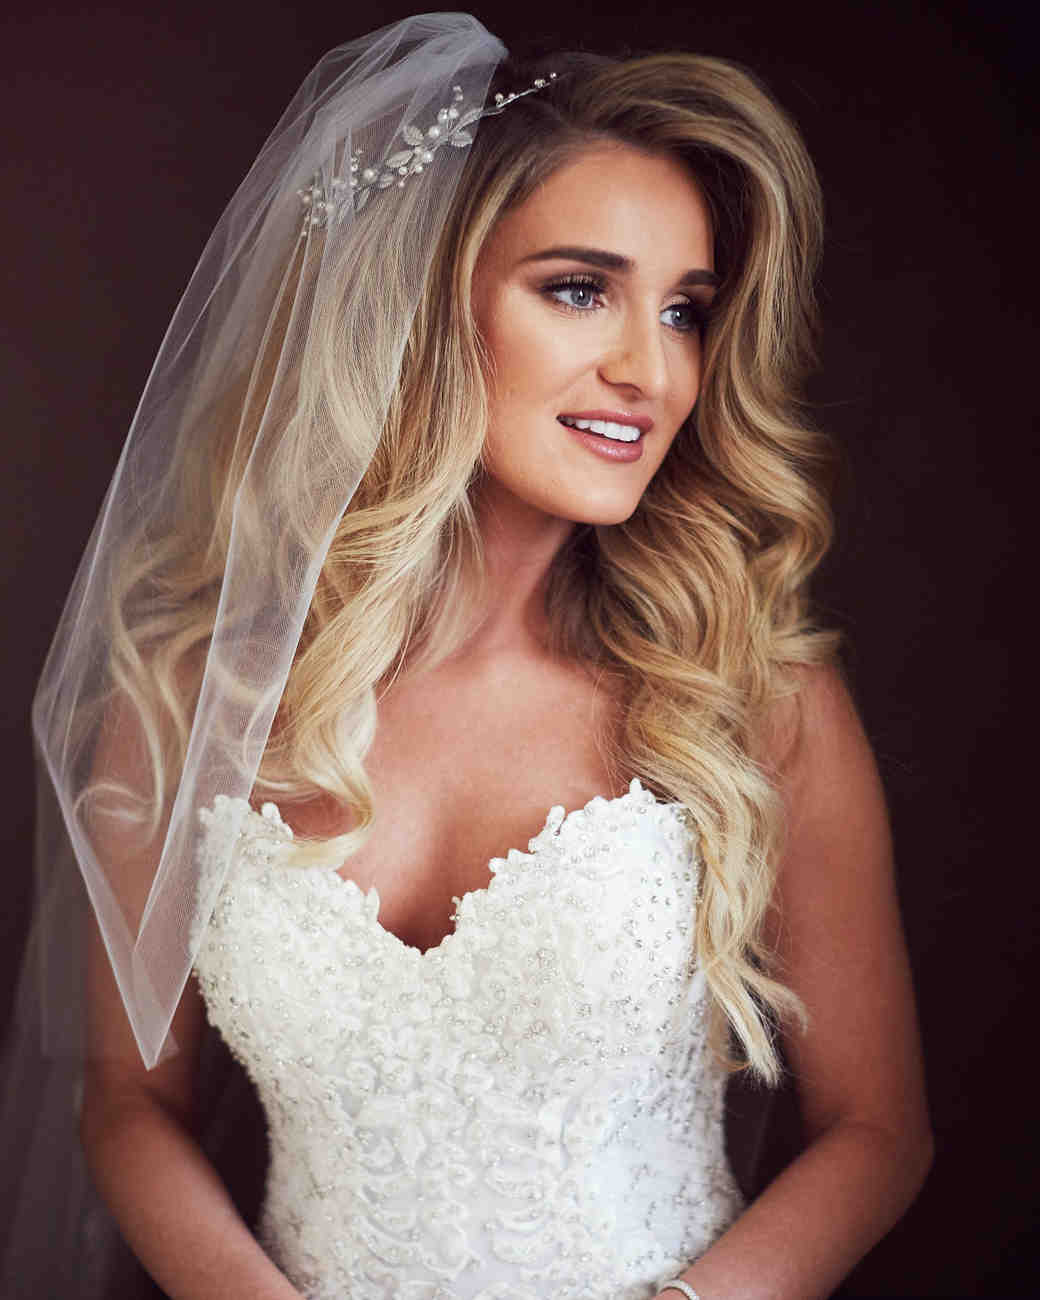 shqipe zenel wedding bride